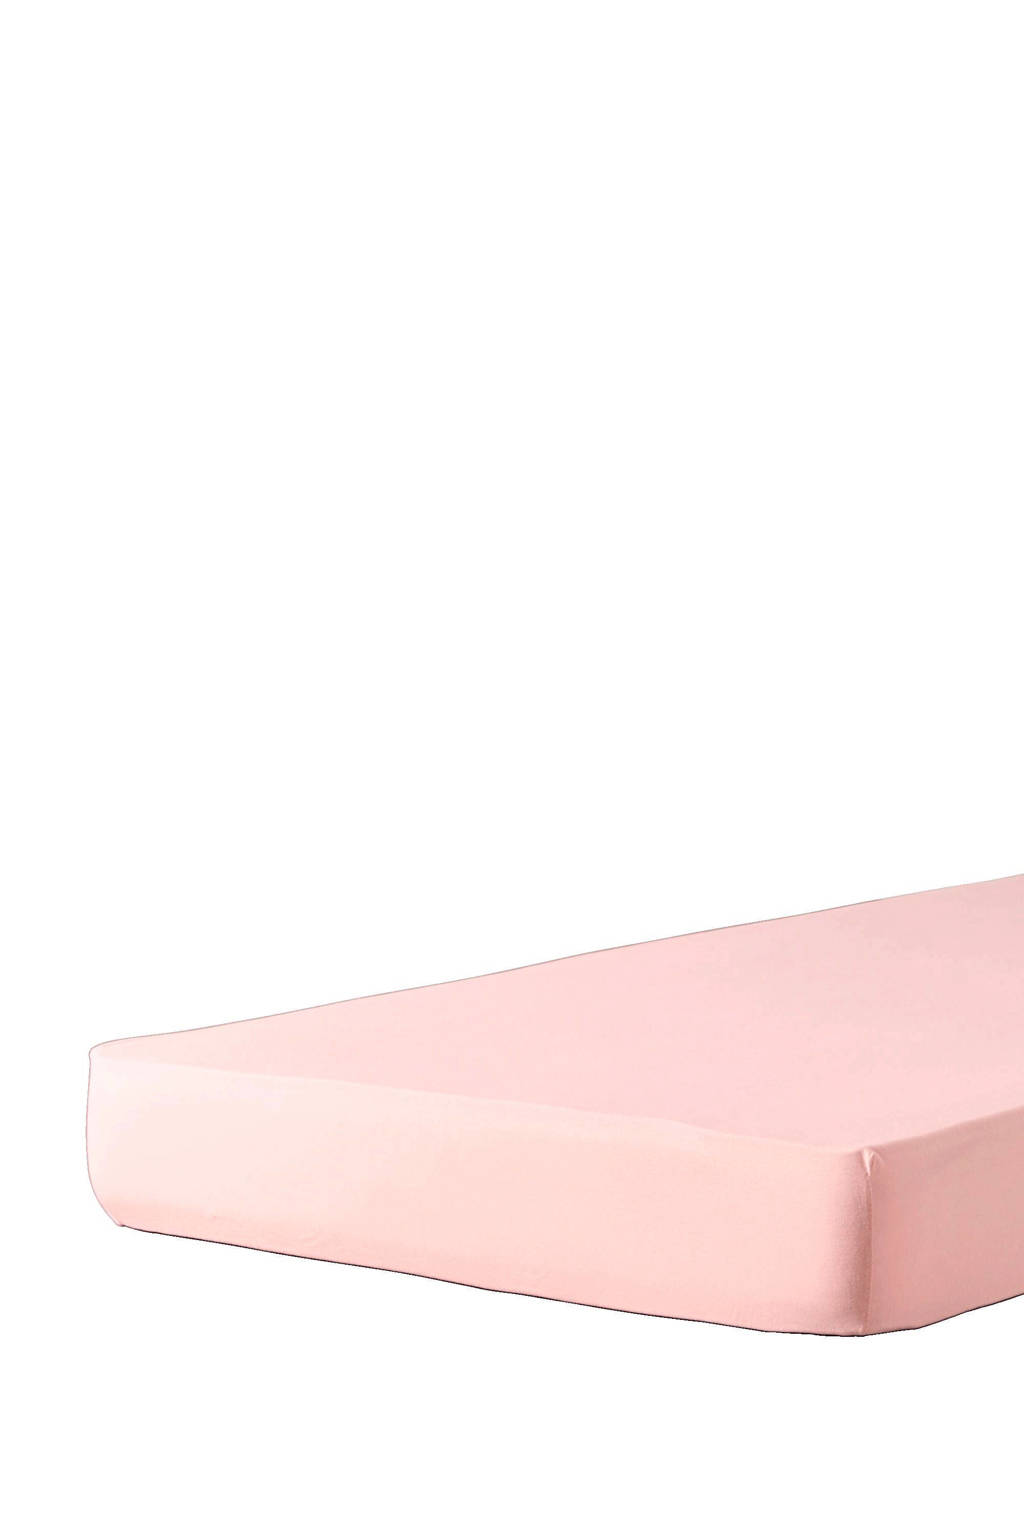 wehkamp home jersey baby hoeslaken ledikant (60x120 cm), Lichtroze